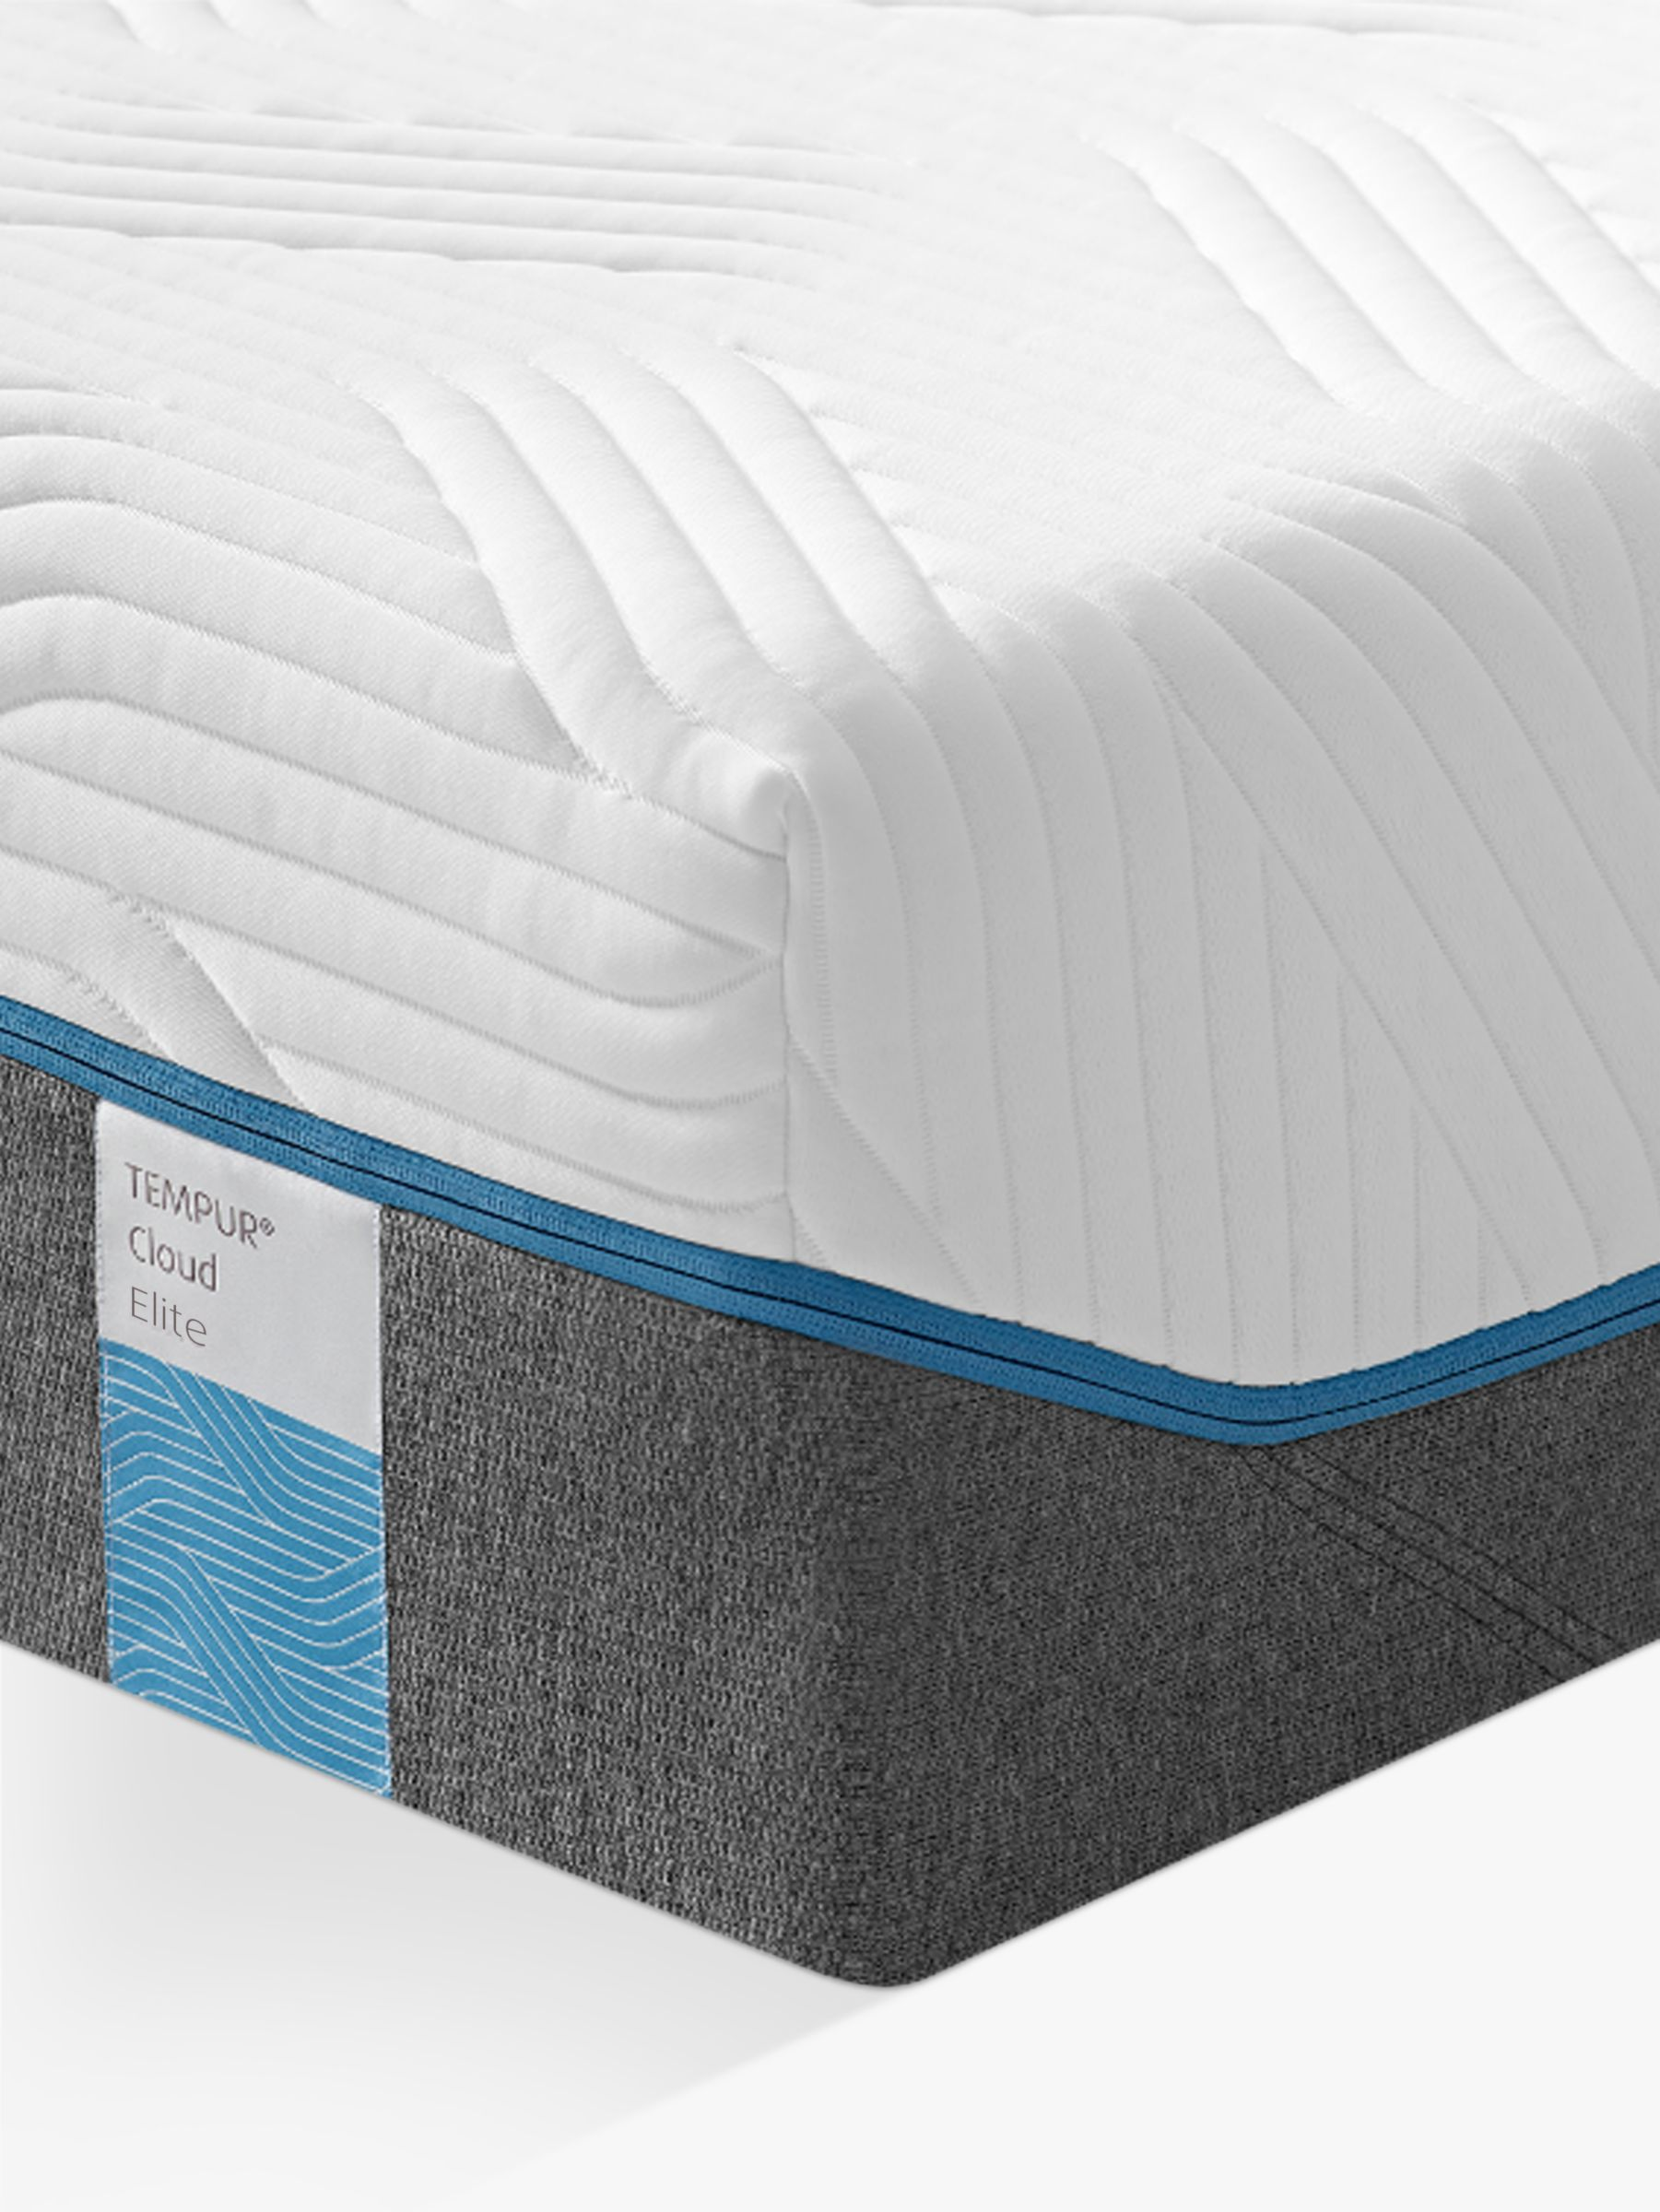 Tempur Tempur Cloud Elite 25 Memory Foam Mattress, Soft, European King Size